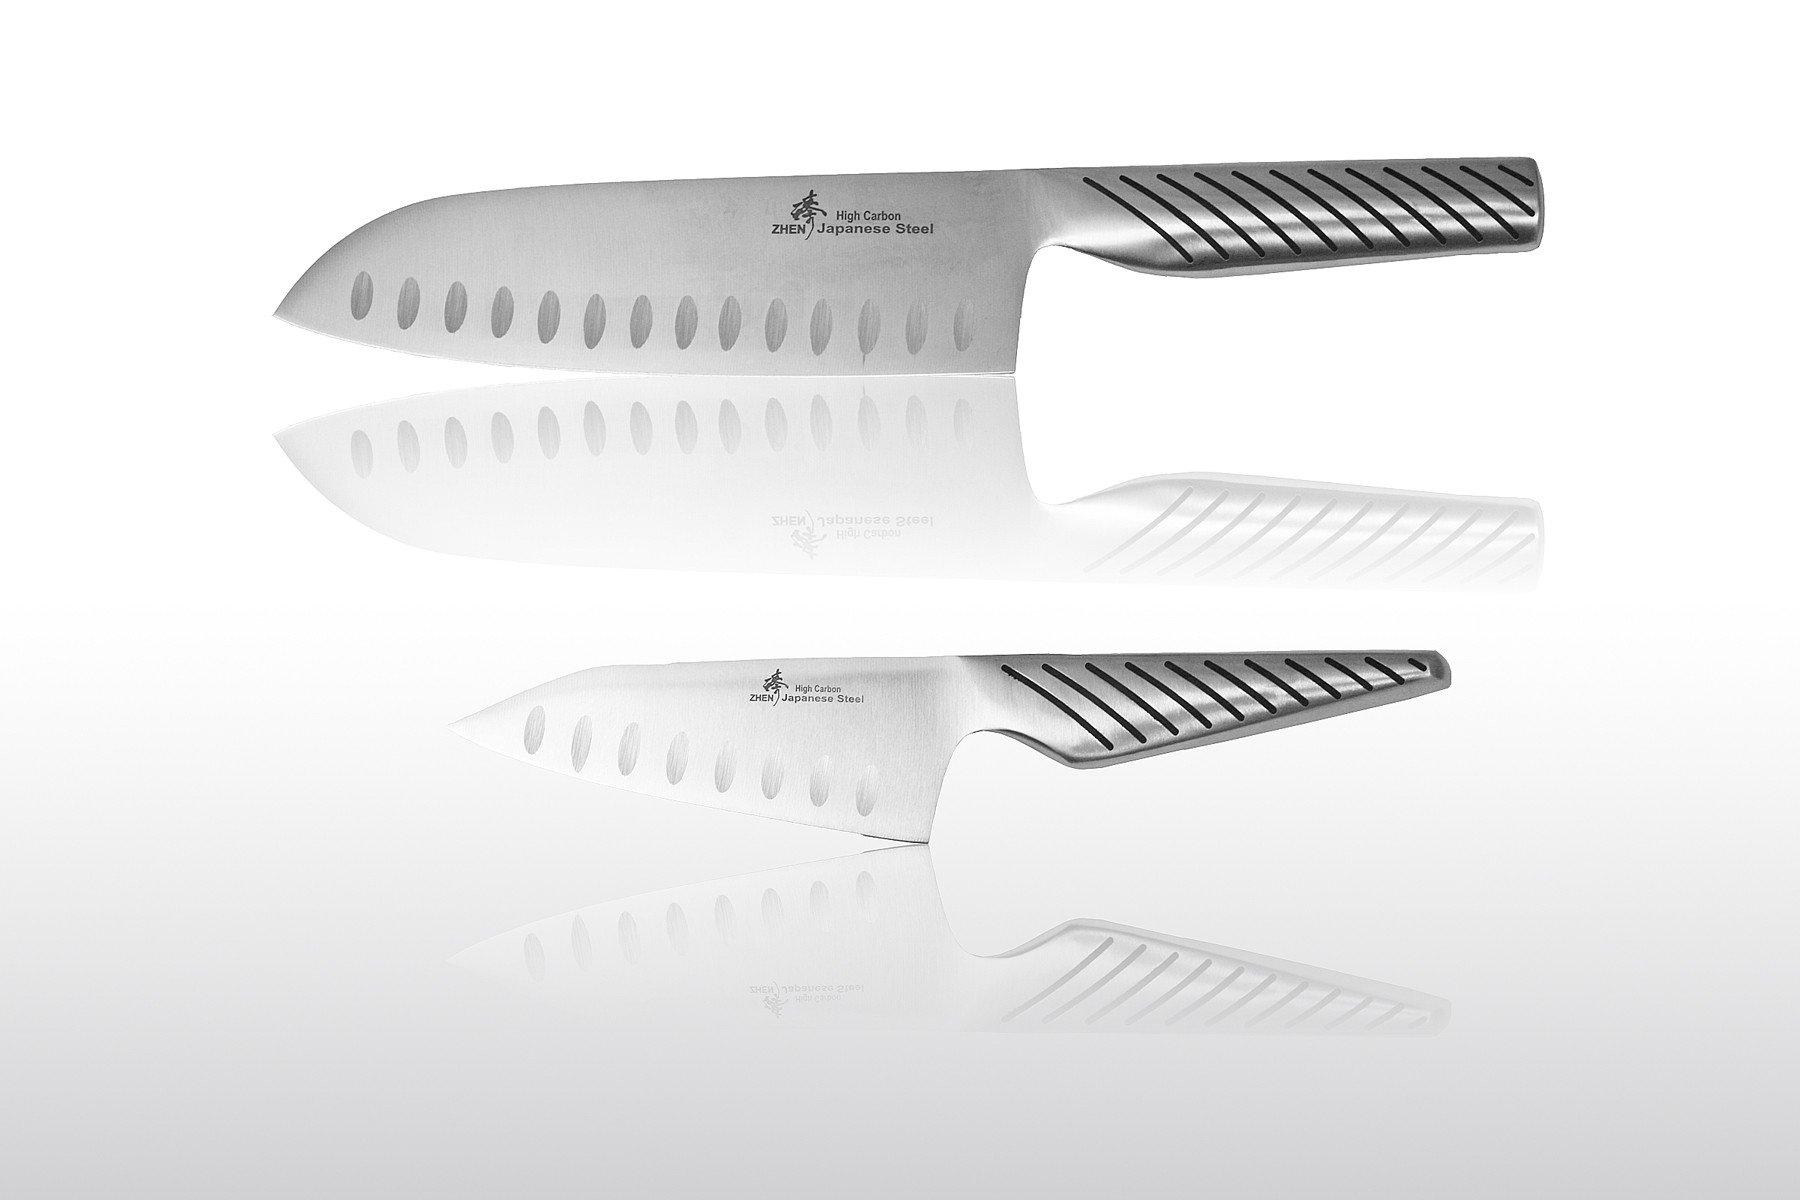 zhen japanese steel 8 inch chefs knife and 7 inch santoku knife set ebay. Black Bedroom Furniture Sets. Home Design Ideas